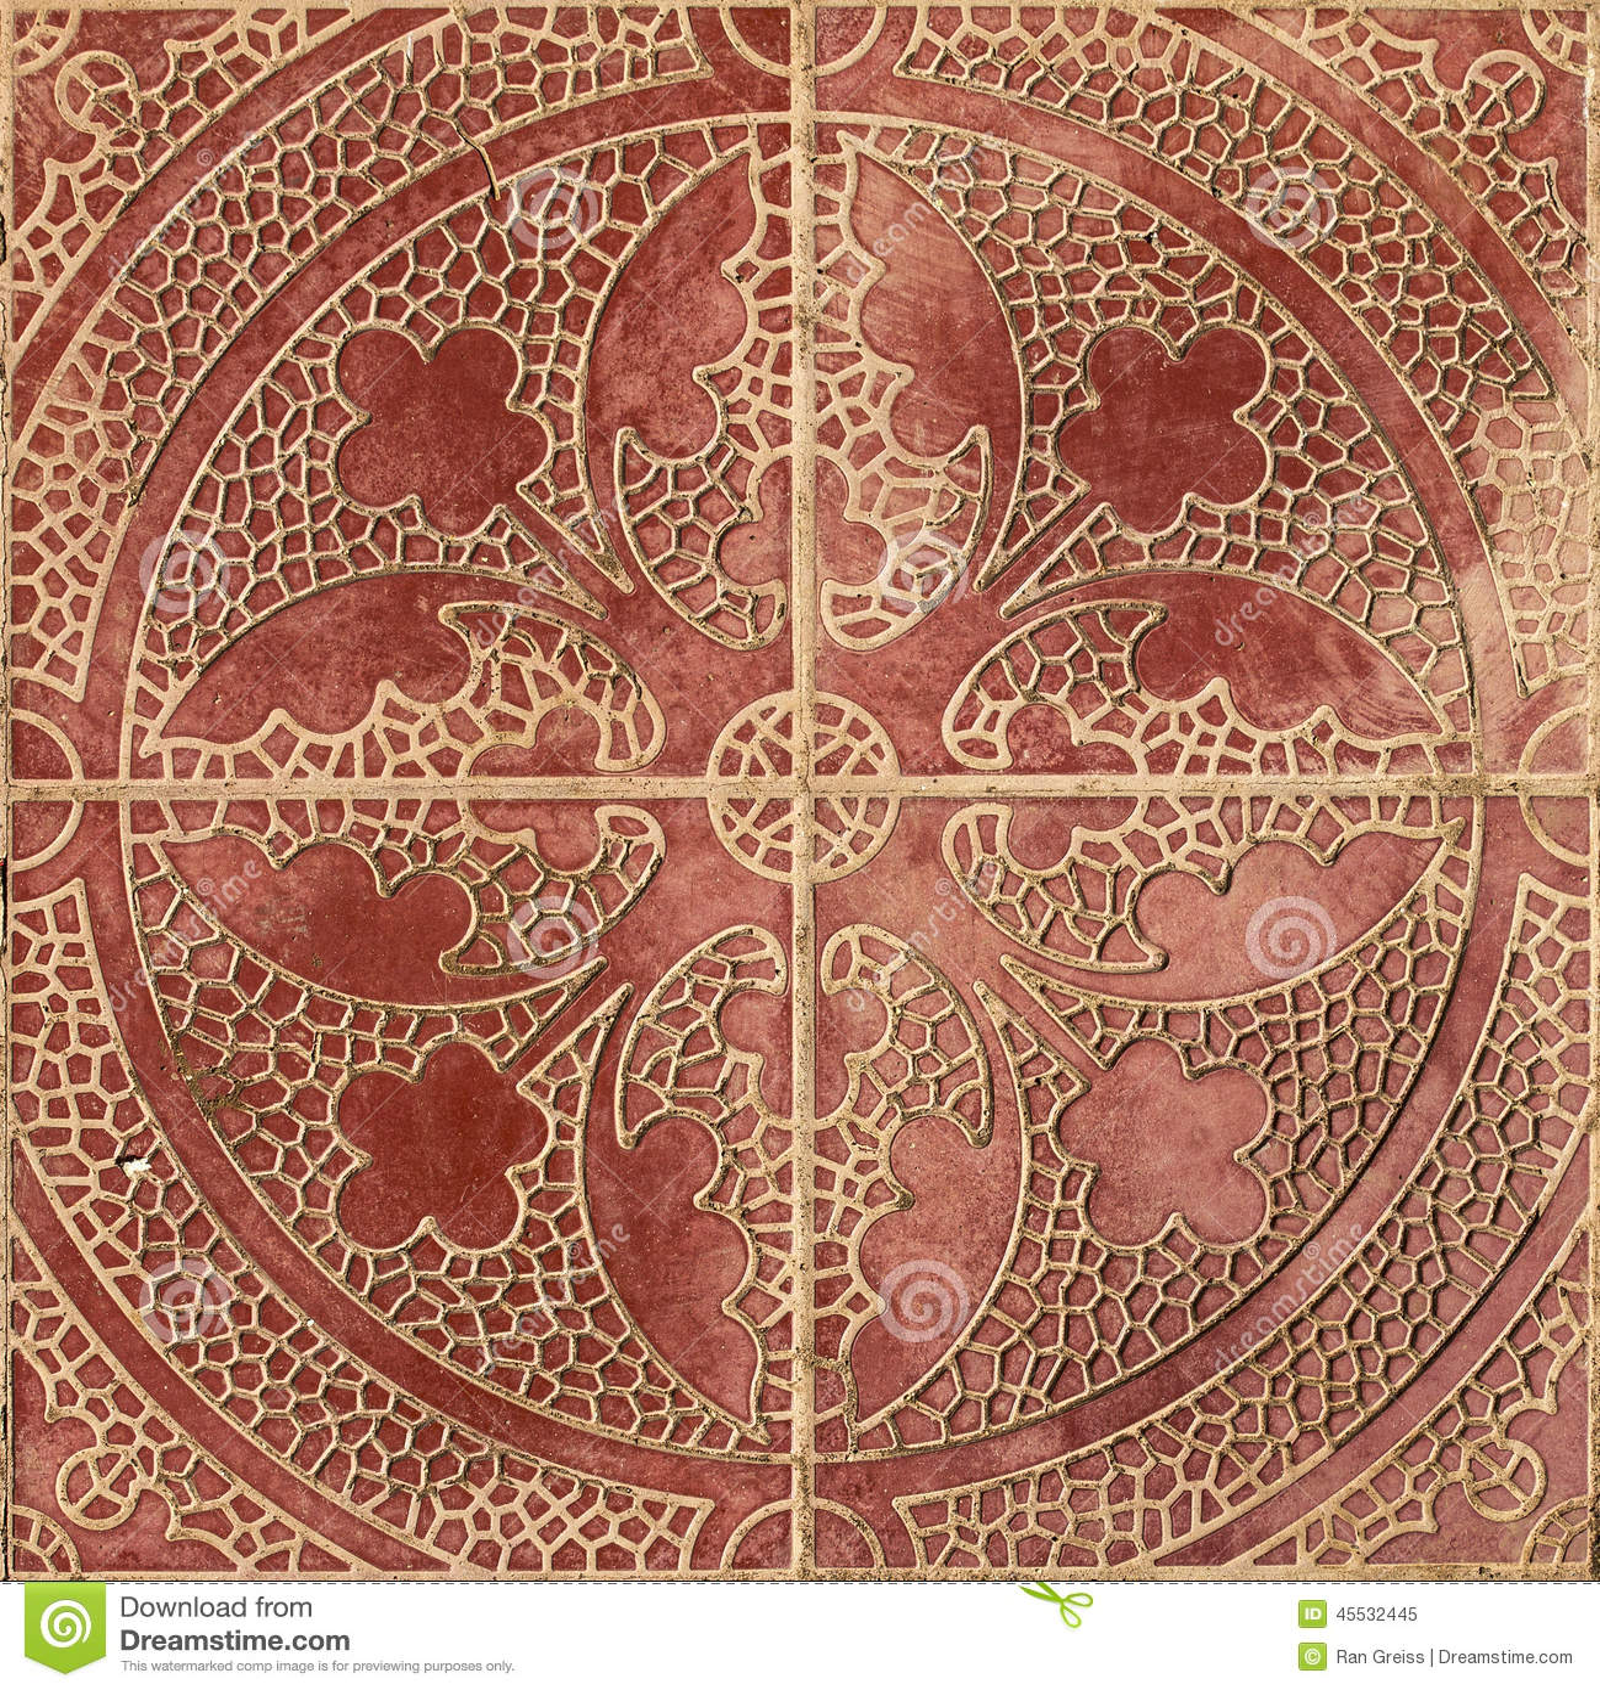 Ethnic Arabic Ornaments Pattern Tiles Design Stock Photo